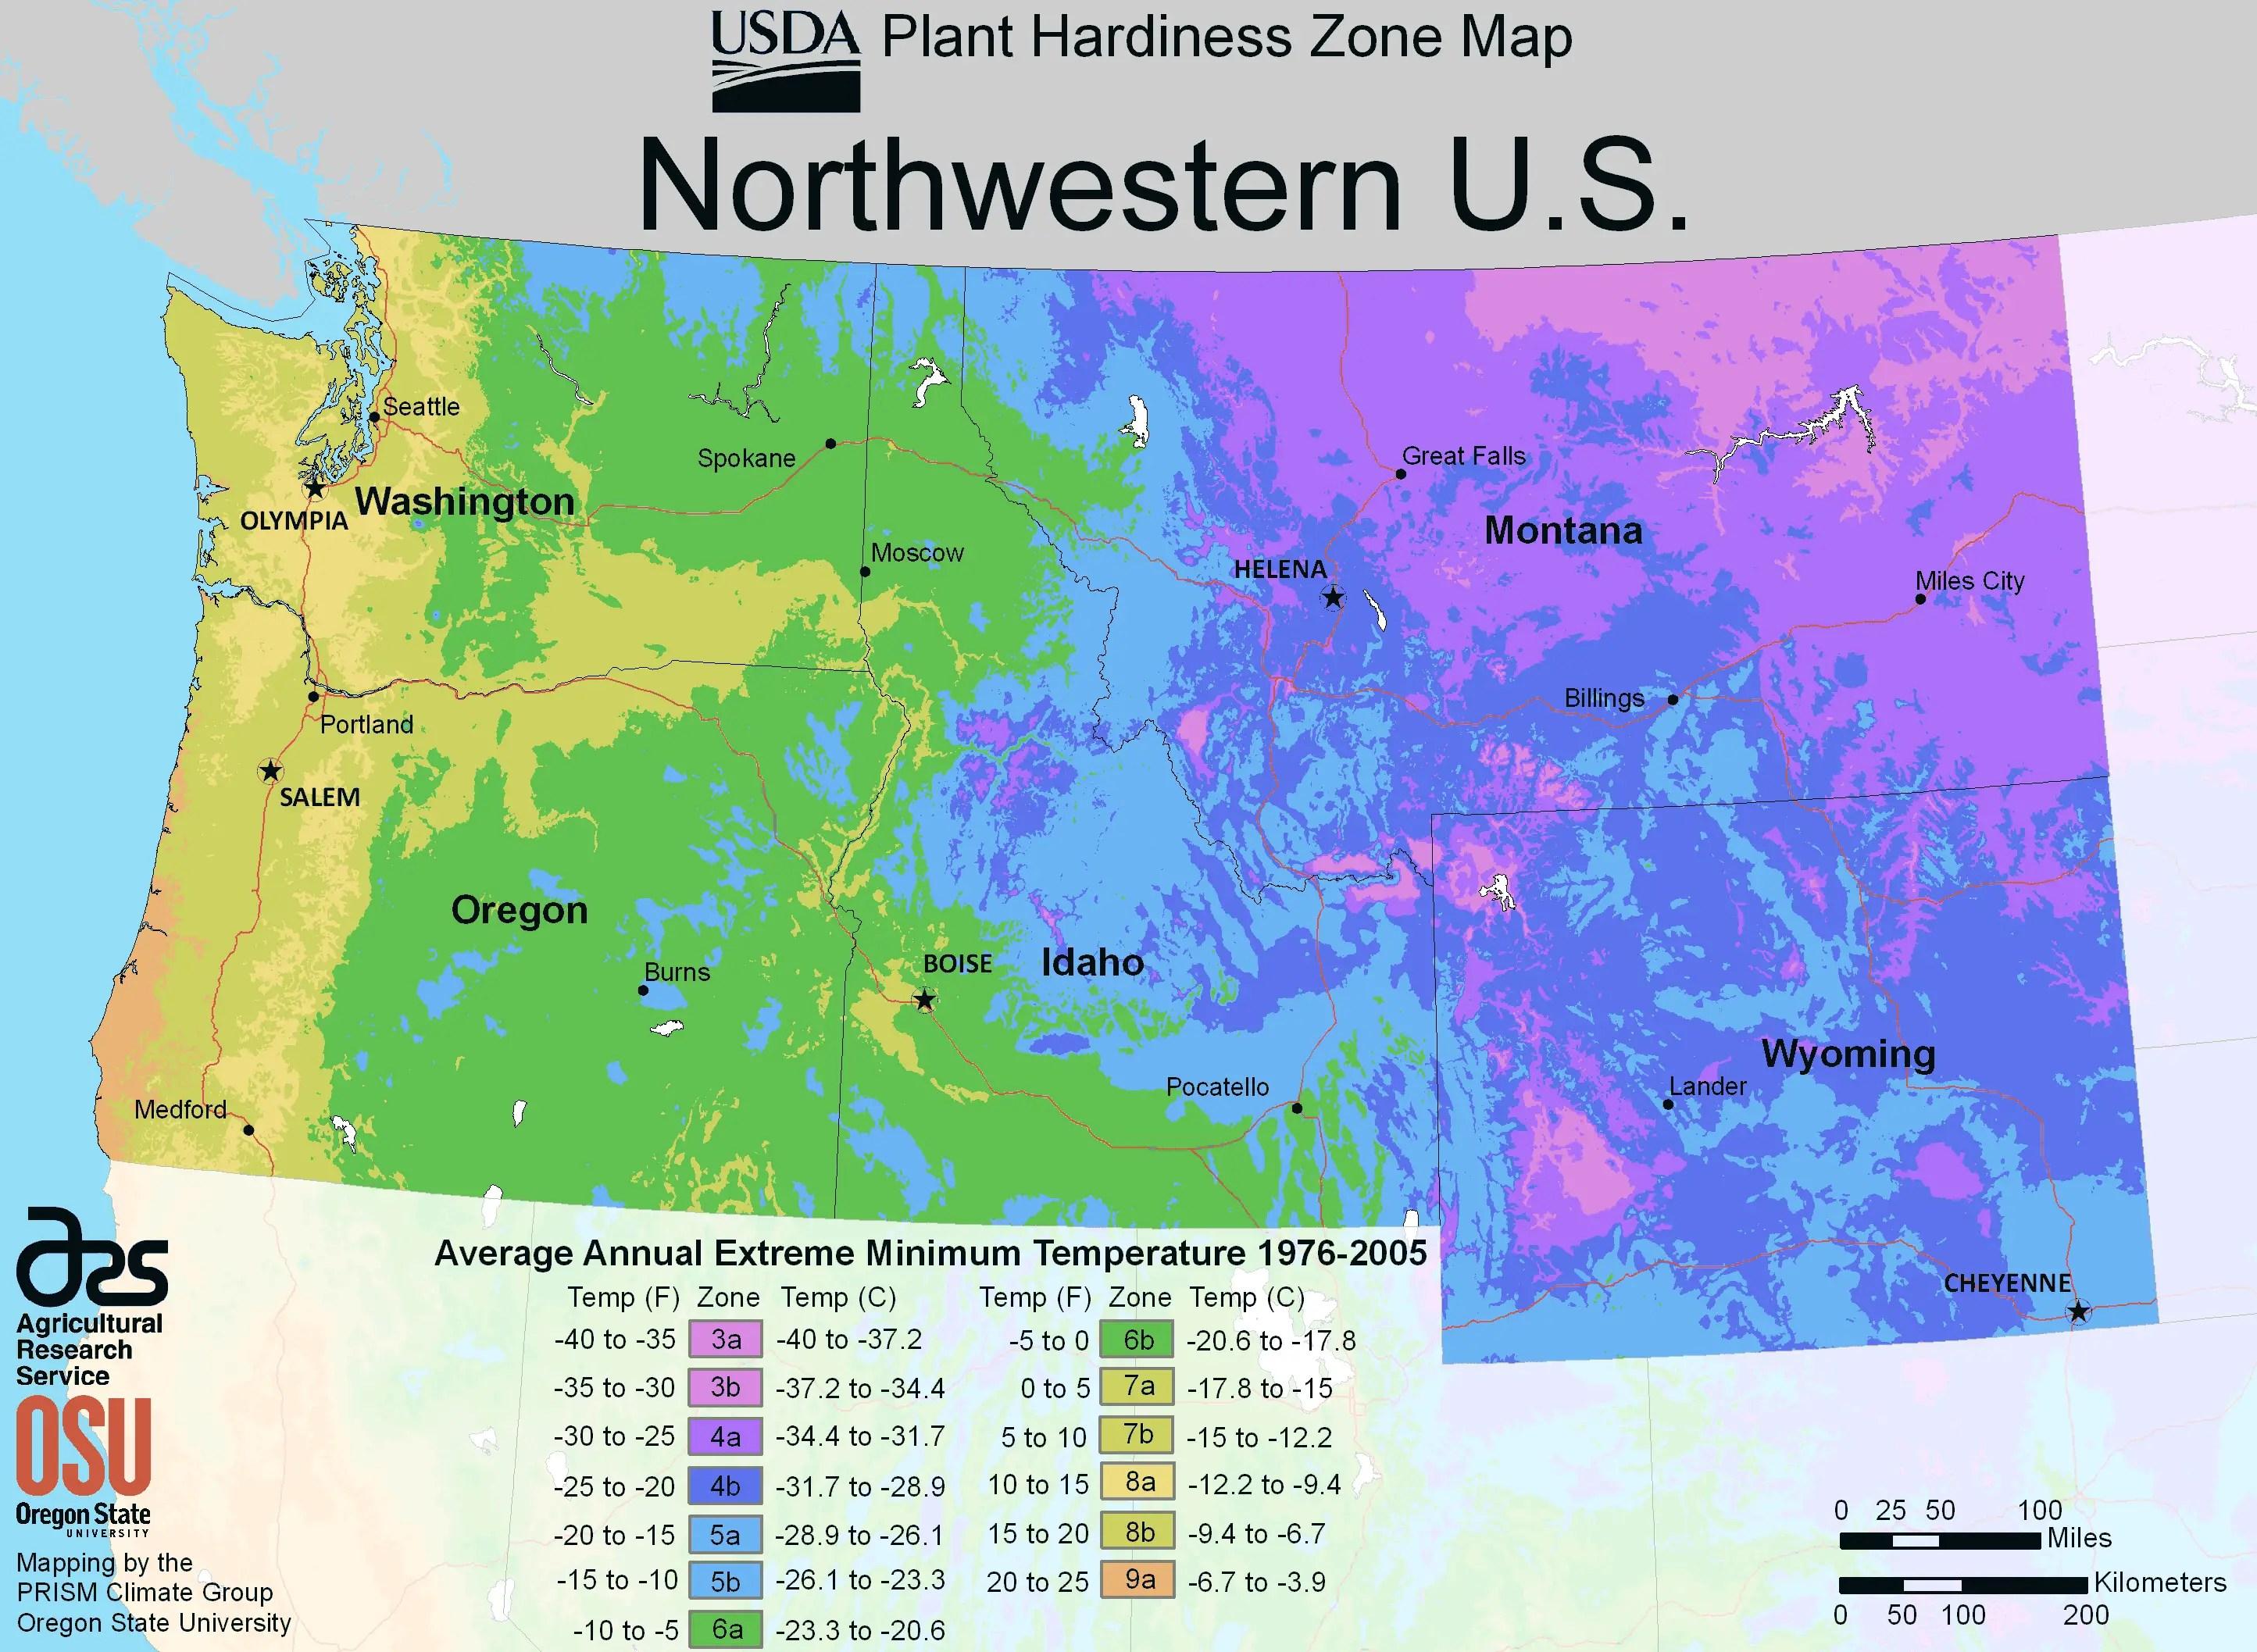 North West Us Plant Hardiness Zone Map Mapsof